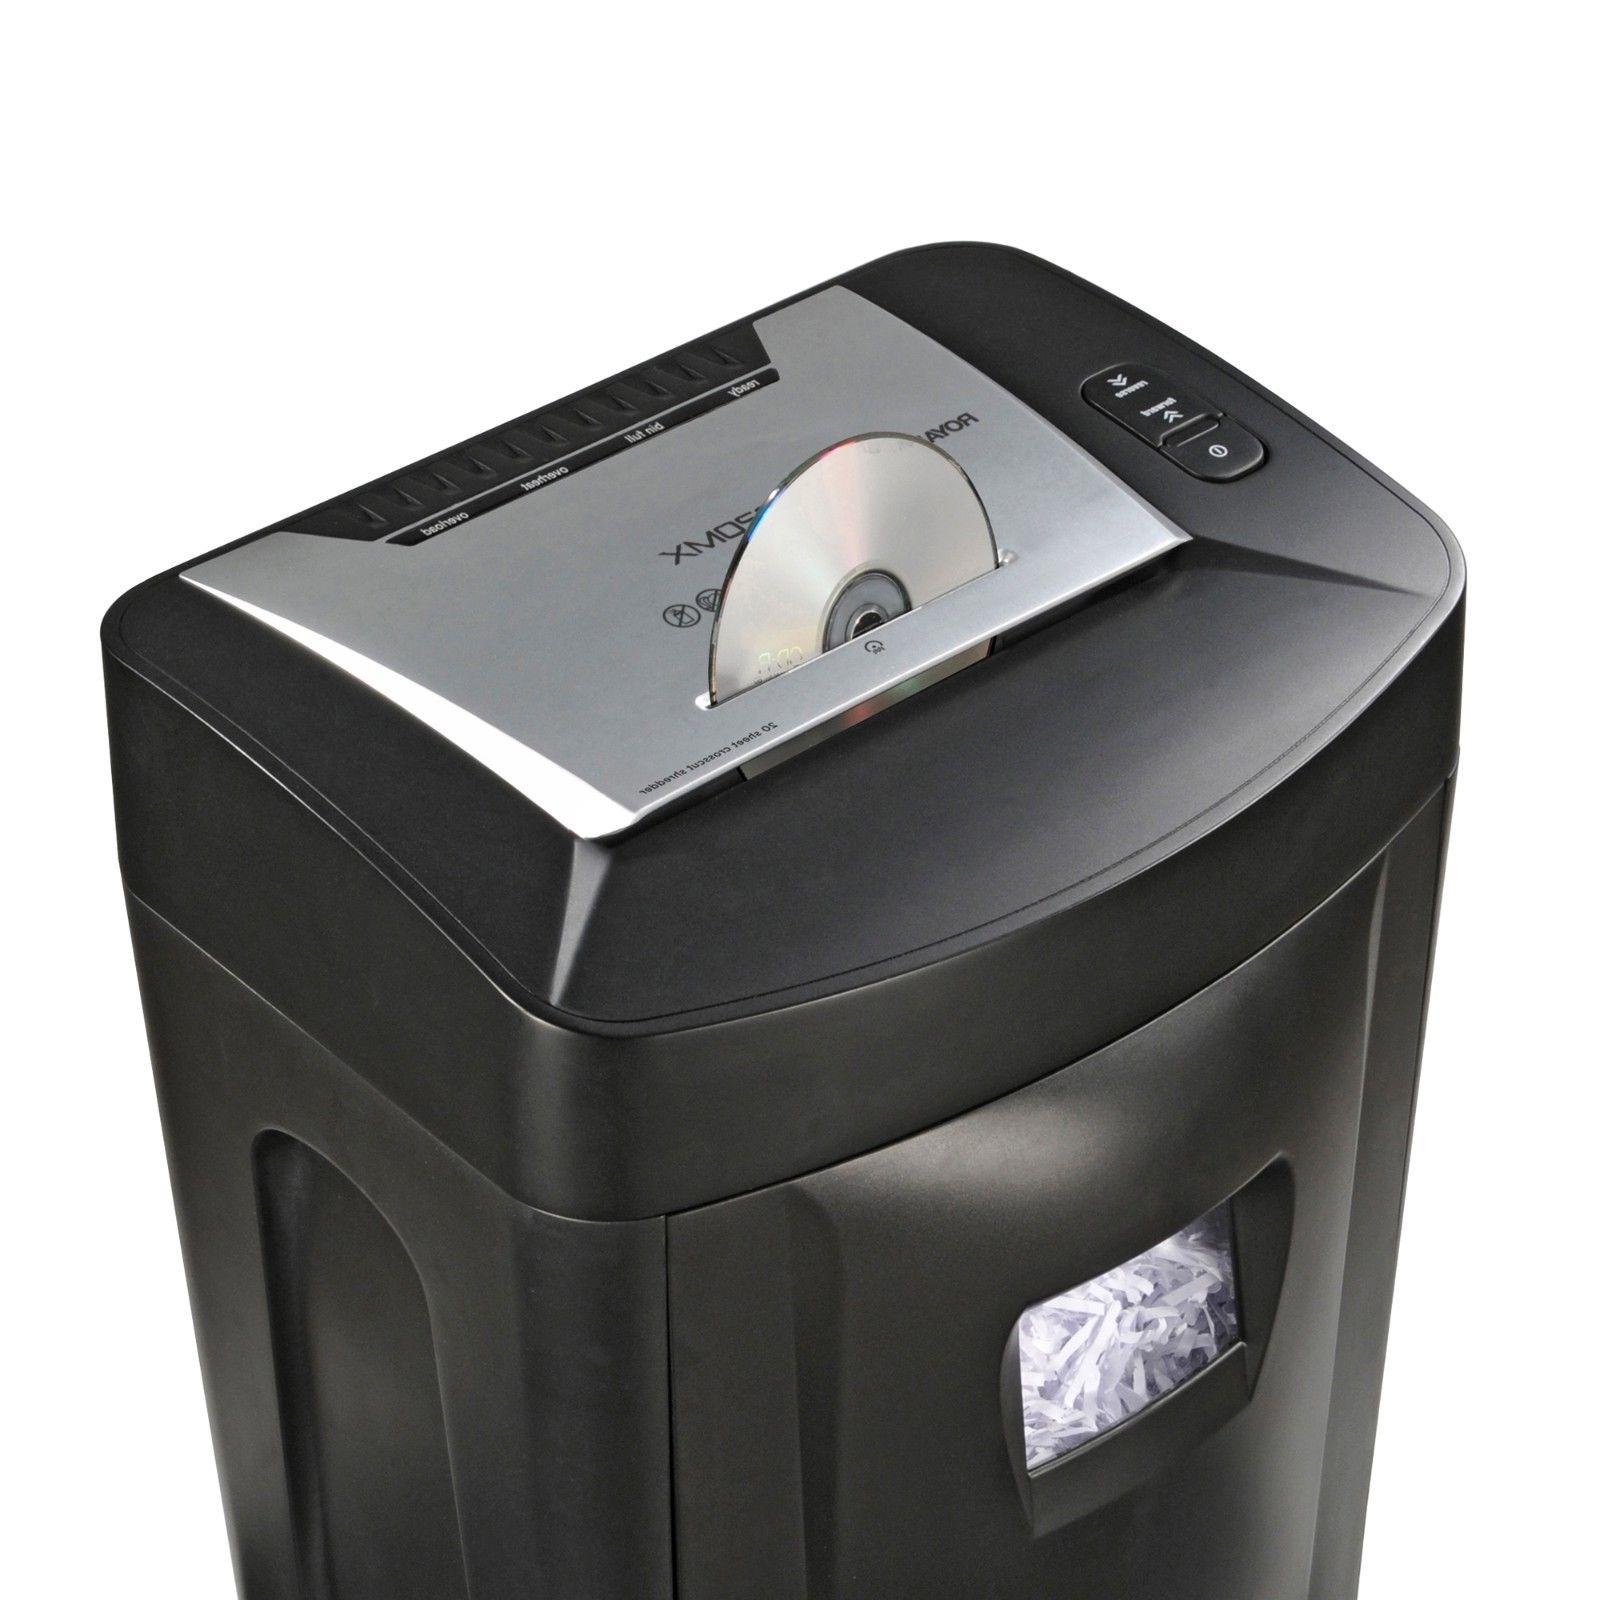 Royal Shredder CDs   6020MX -